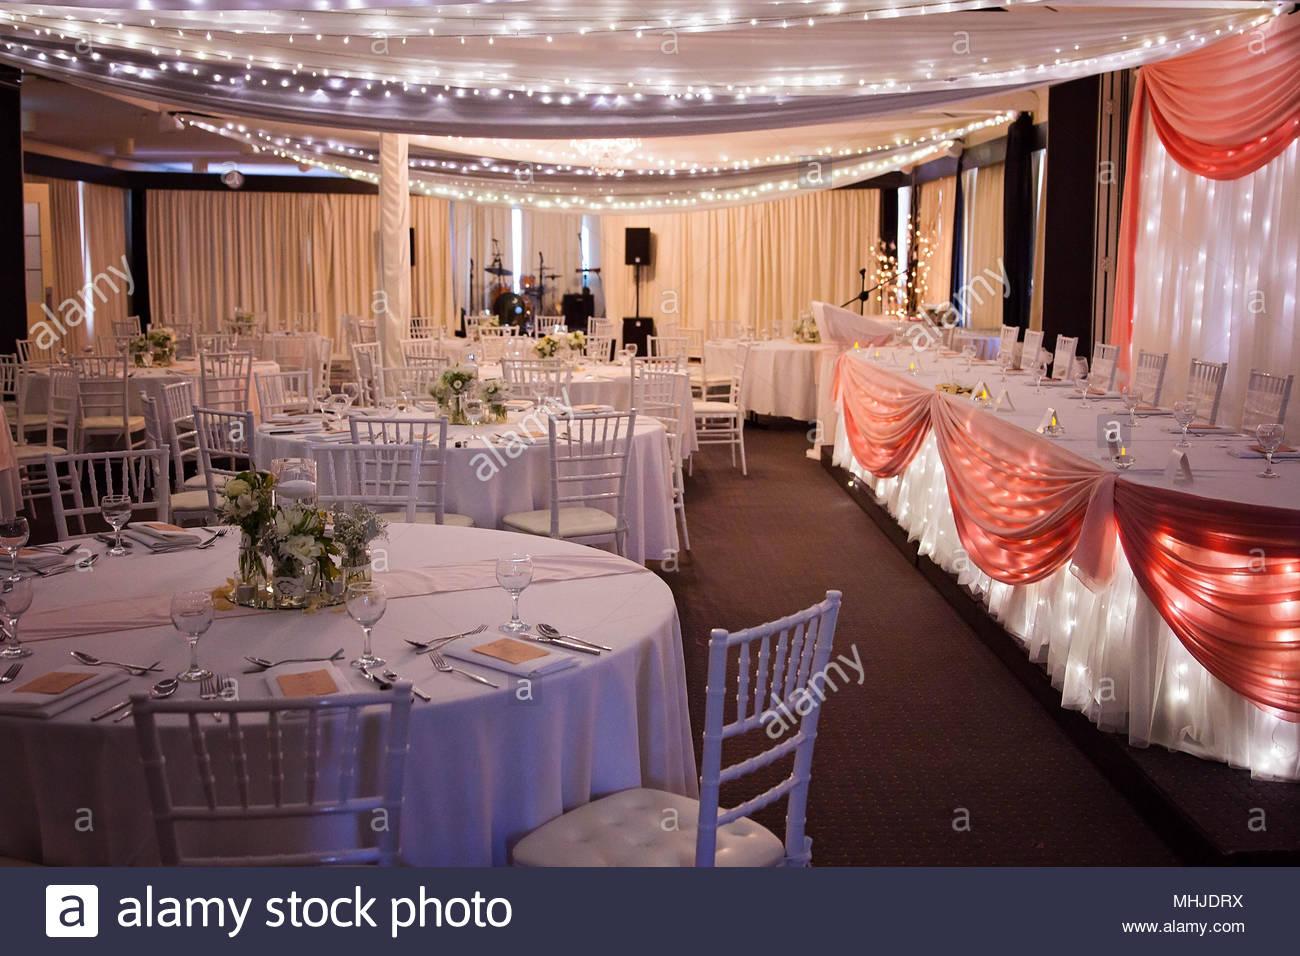 Wedding Reception Set Up Stock Photo 182958830 Alamy